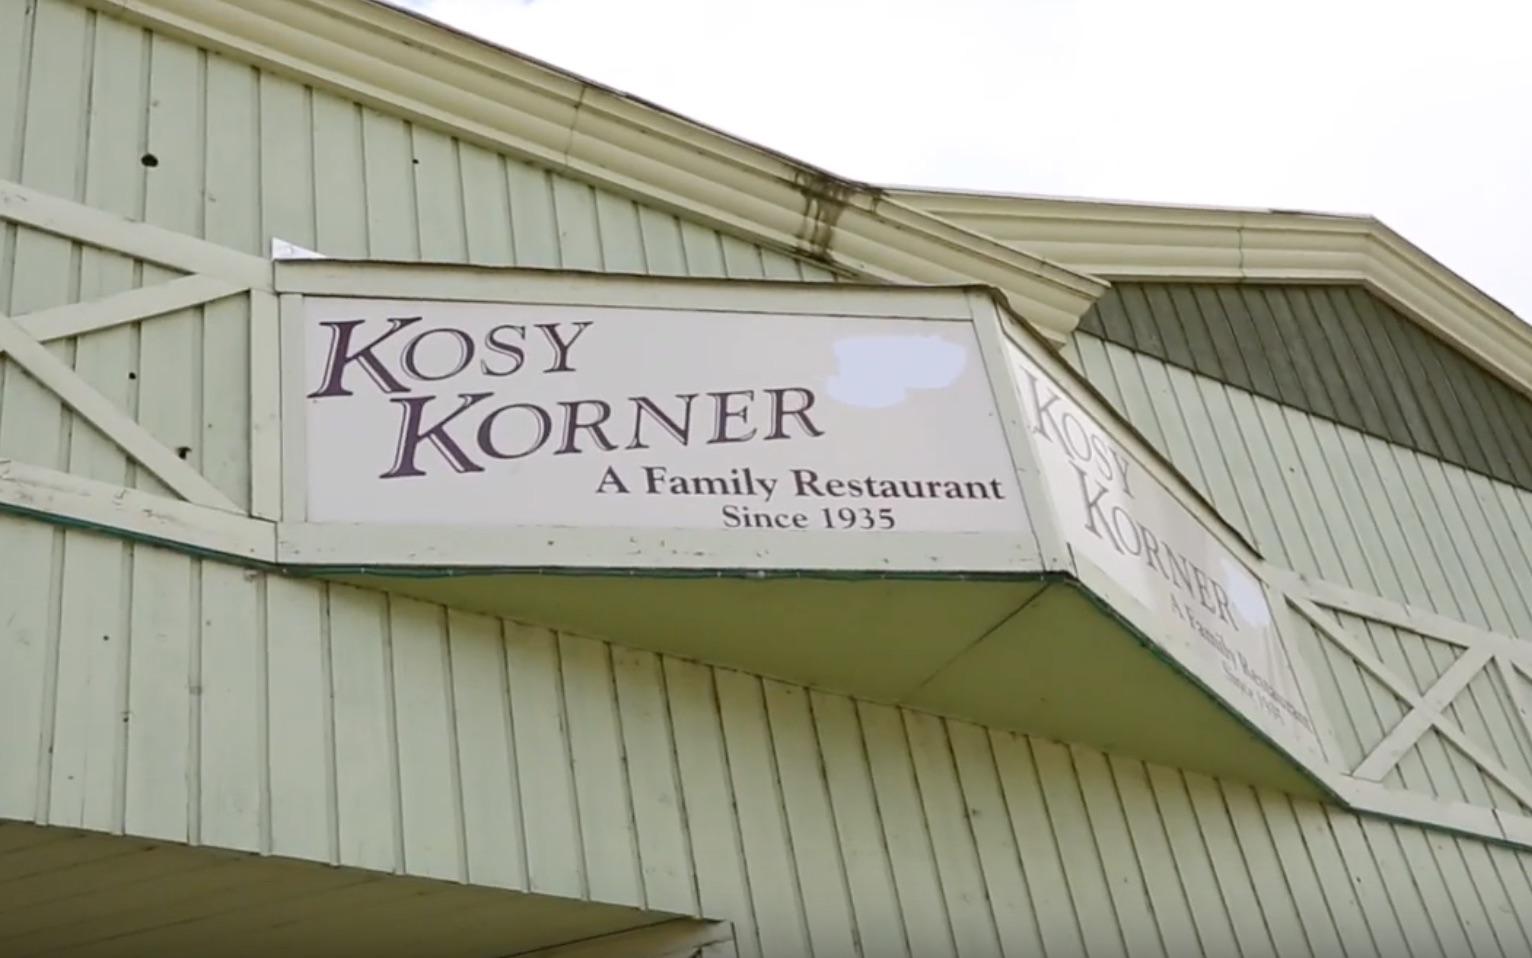 Kozy Korner restaurant Haliburton view of exterior